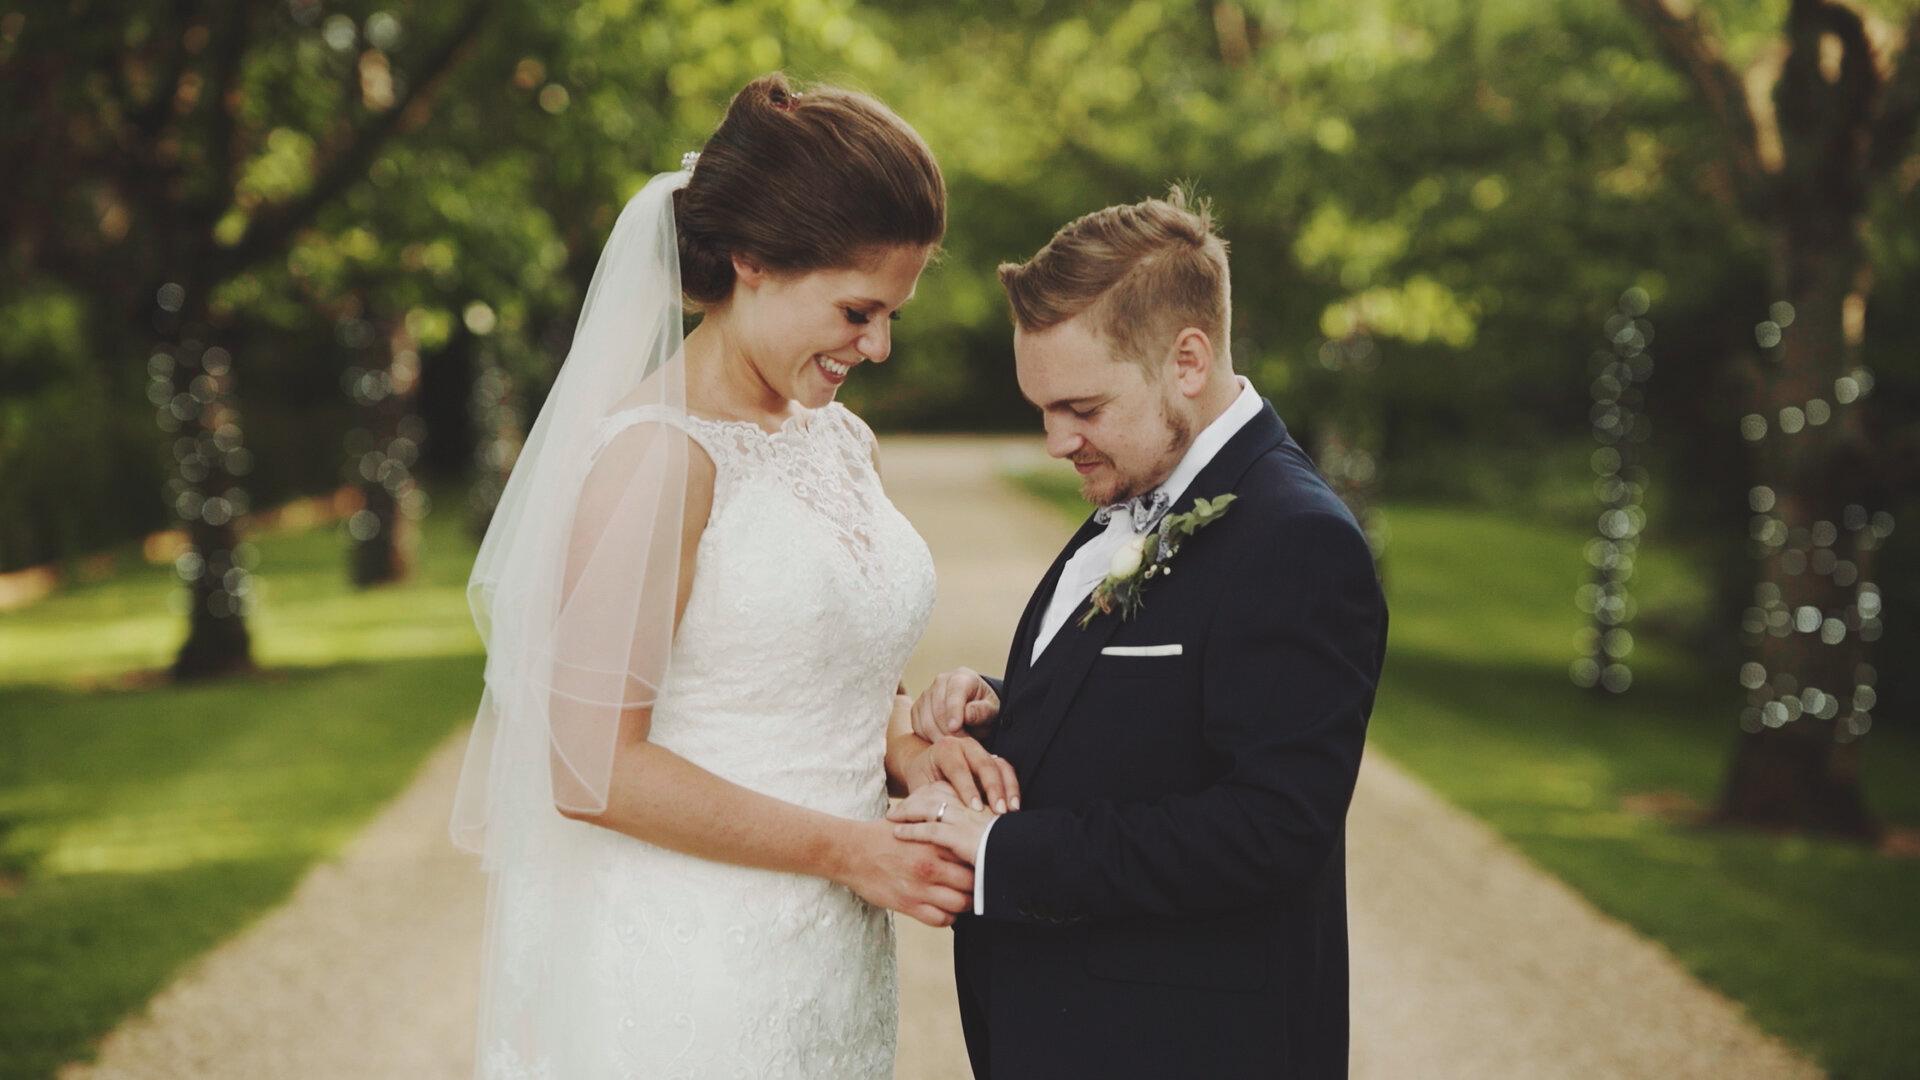 Susanna & Adam - Stills - Context Weddings42.jpg